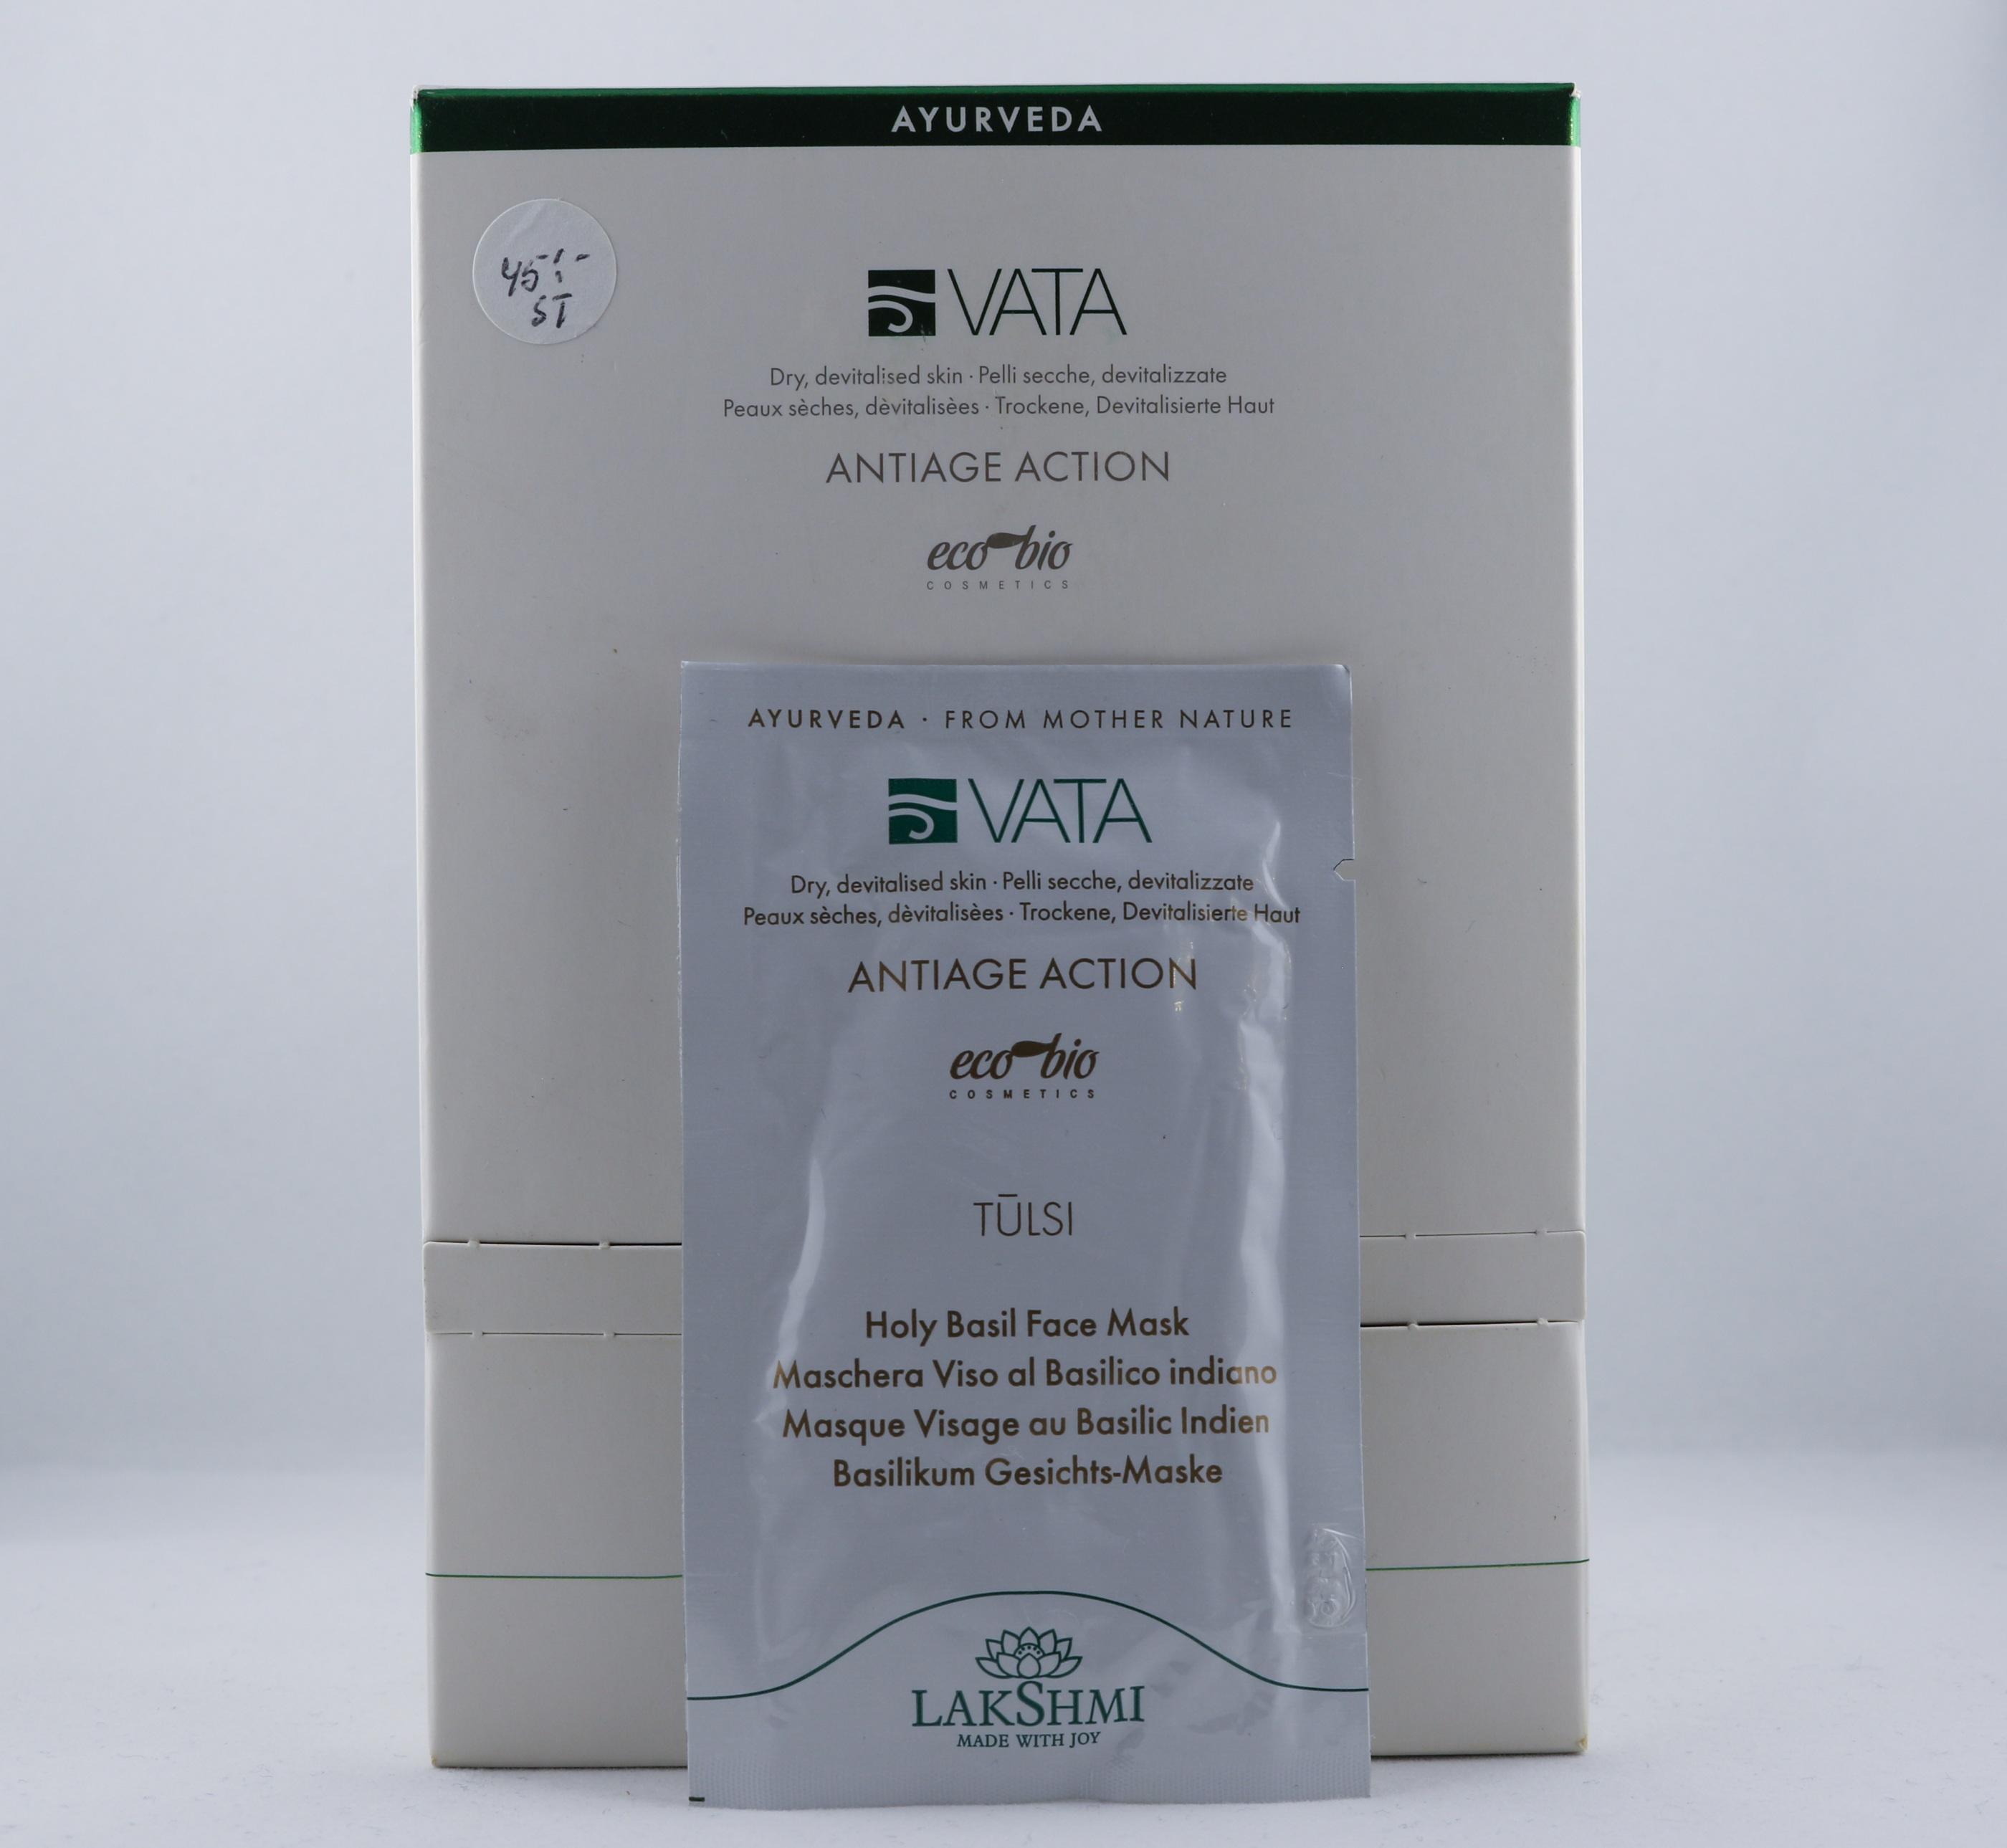 Vata Holy Basil Face Mask hudvårdsprodukt hudvårdstyp alternativ hälsa wellness ayurveda ansikte